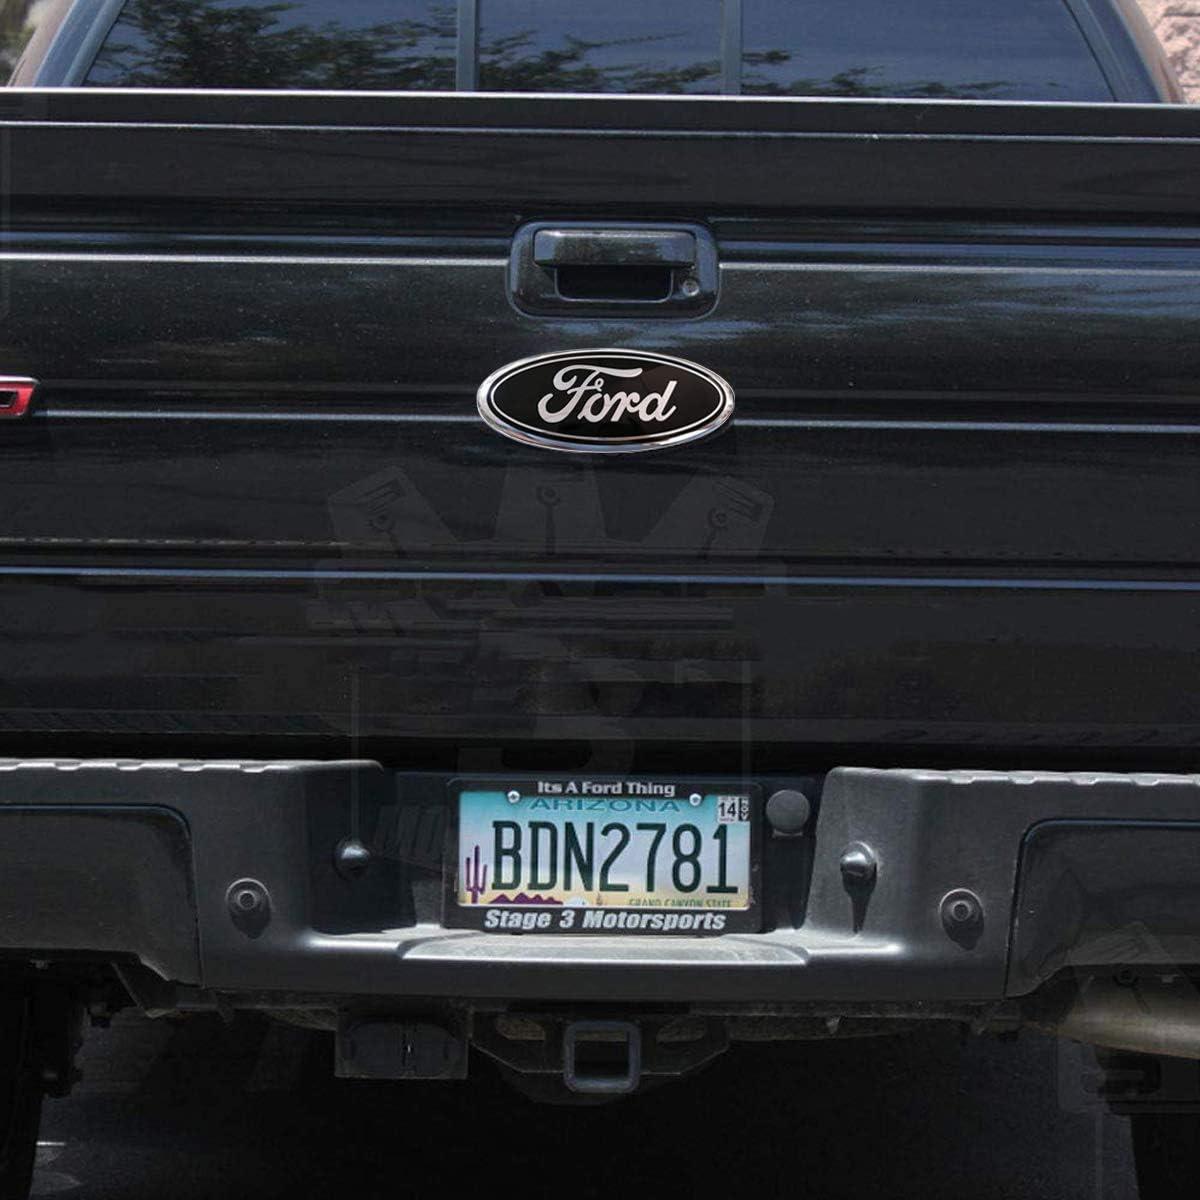 F150 Emblem Oval 9X3.5 American Flag Ford Front Grille Tailgate Emblem Decal Badge Nameplate Fits for 04-14 F250 F350,11-14 Edge,11-16 Explorer,06-11 Ranger 9inch Ford Emblem